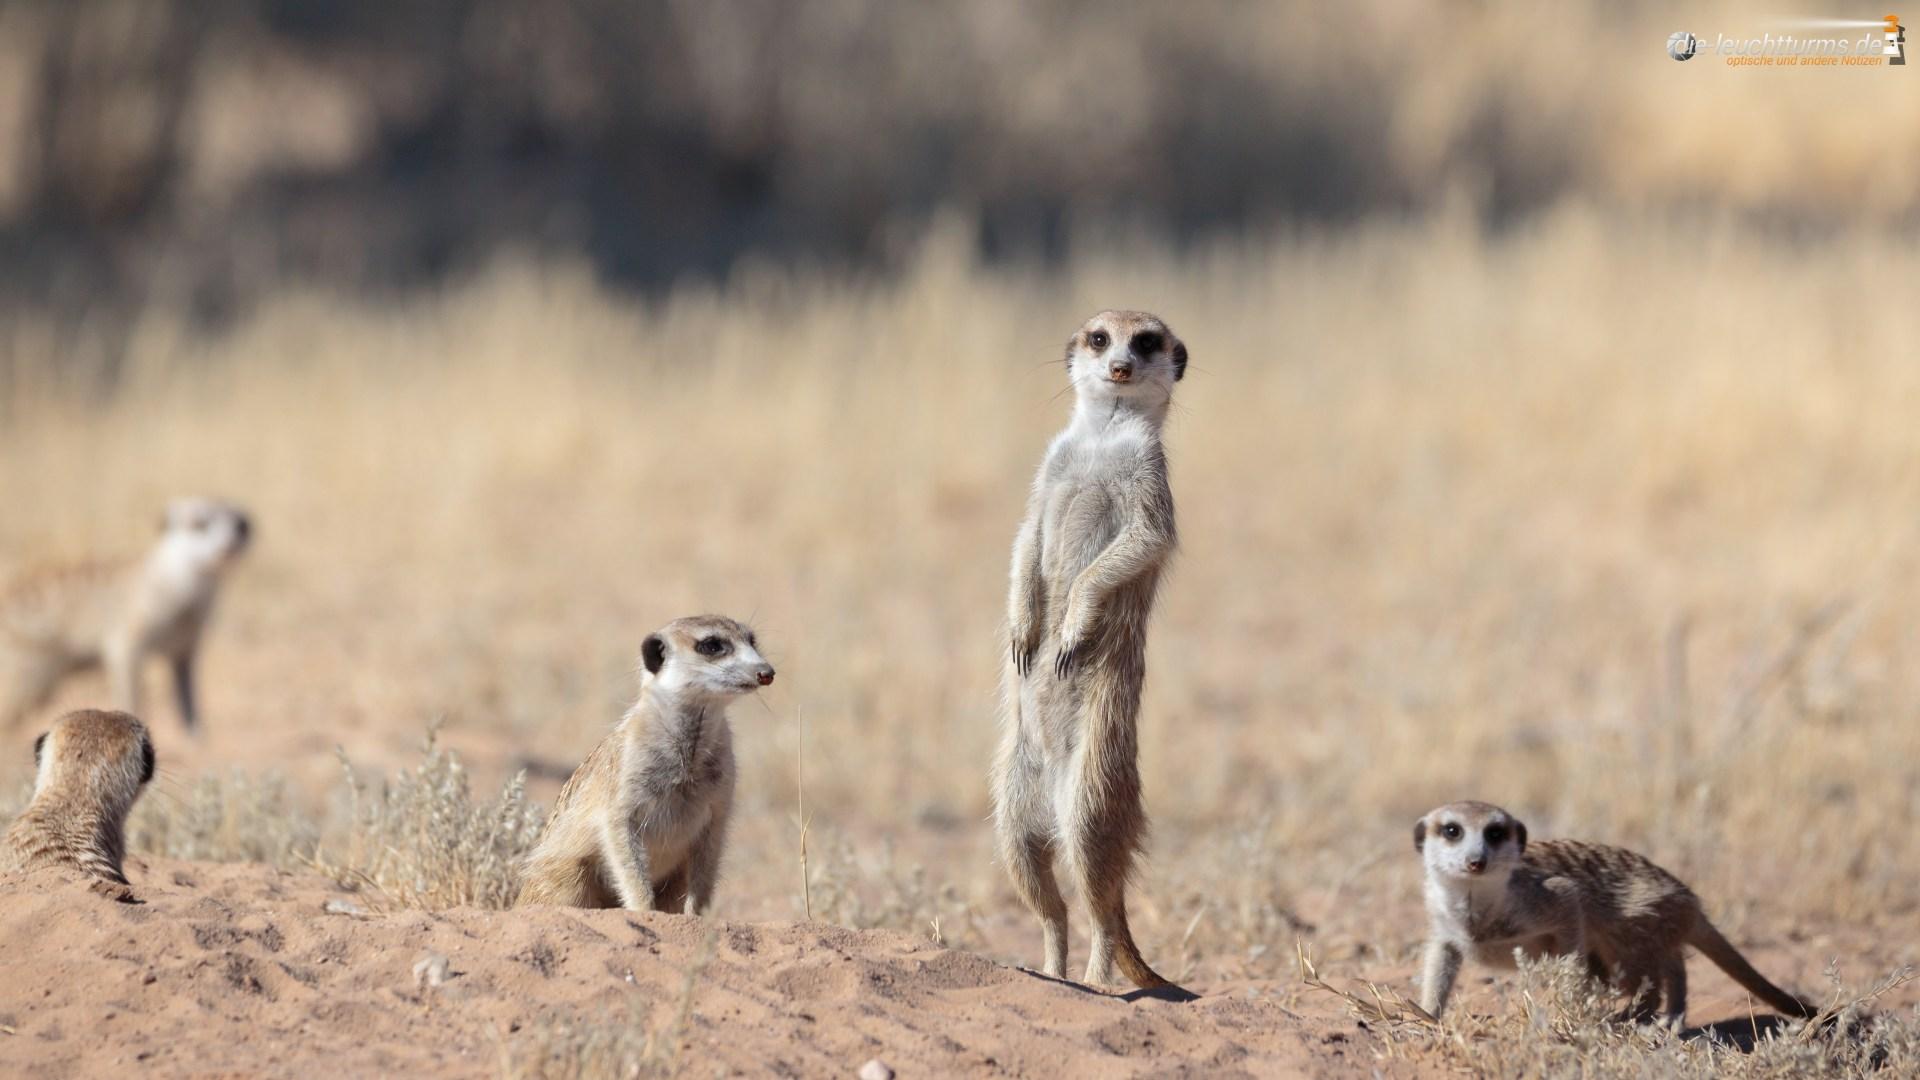 Guardians of the Kgalagadi